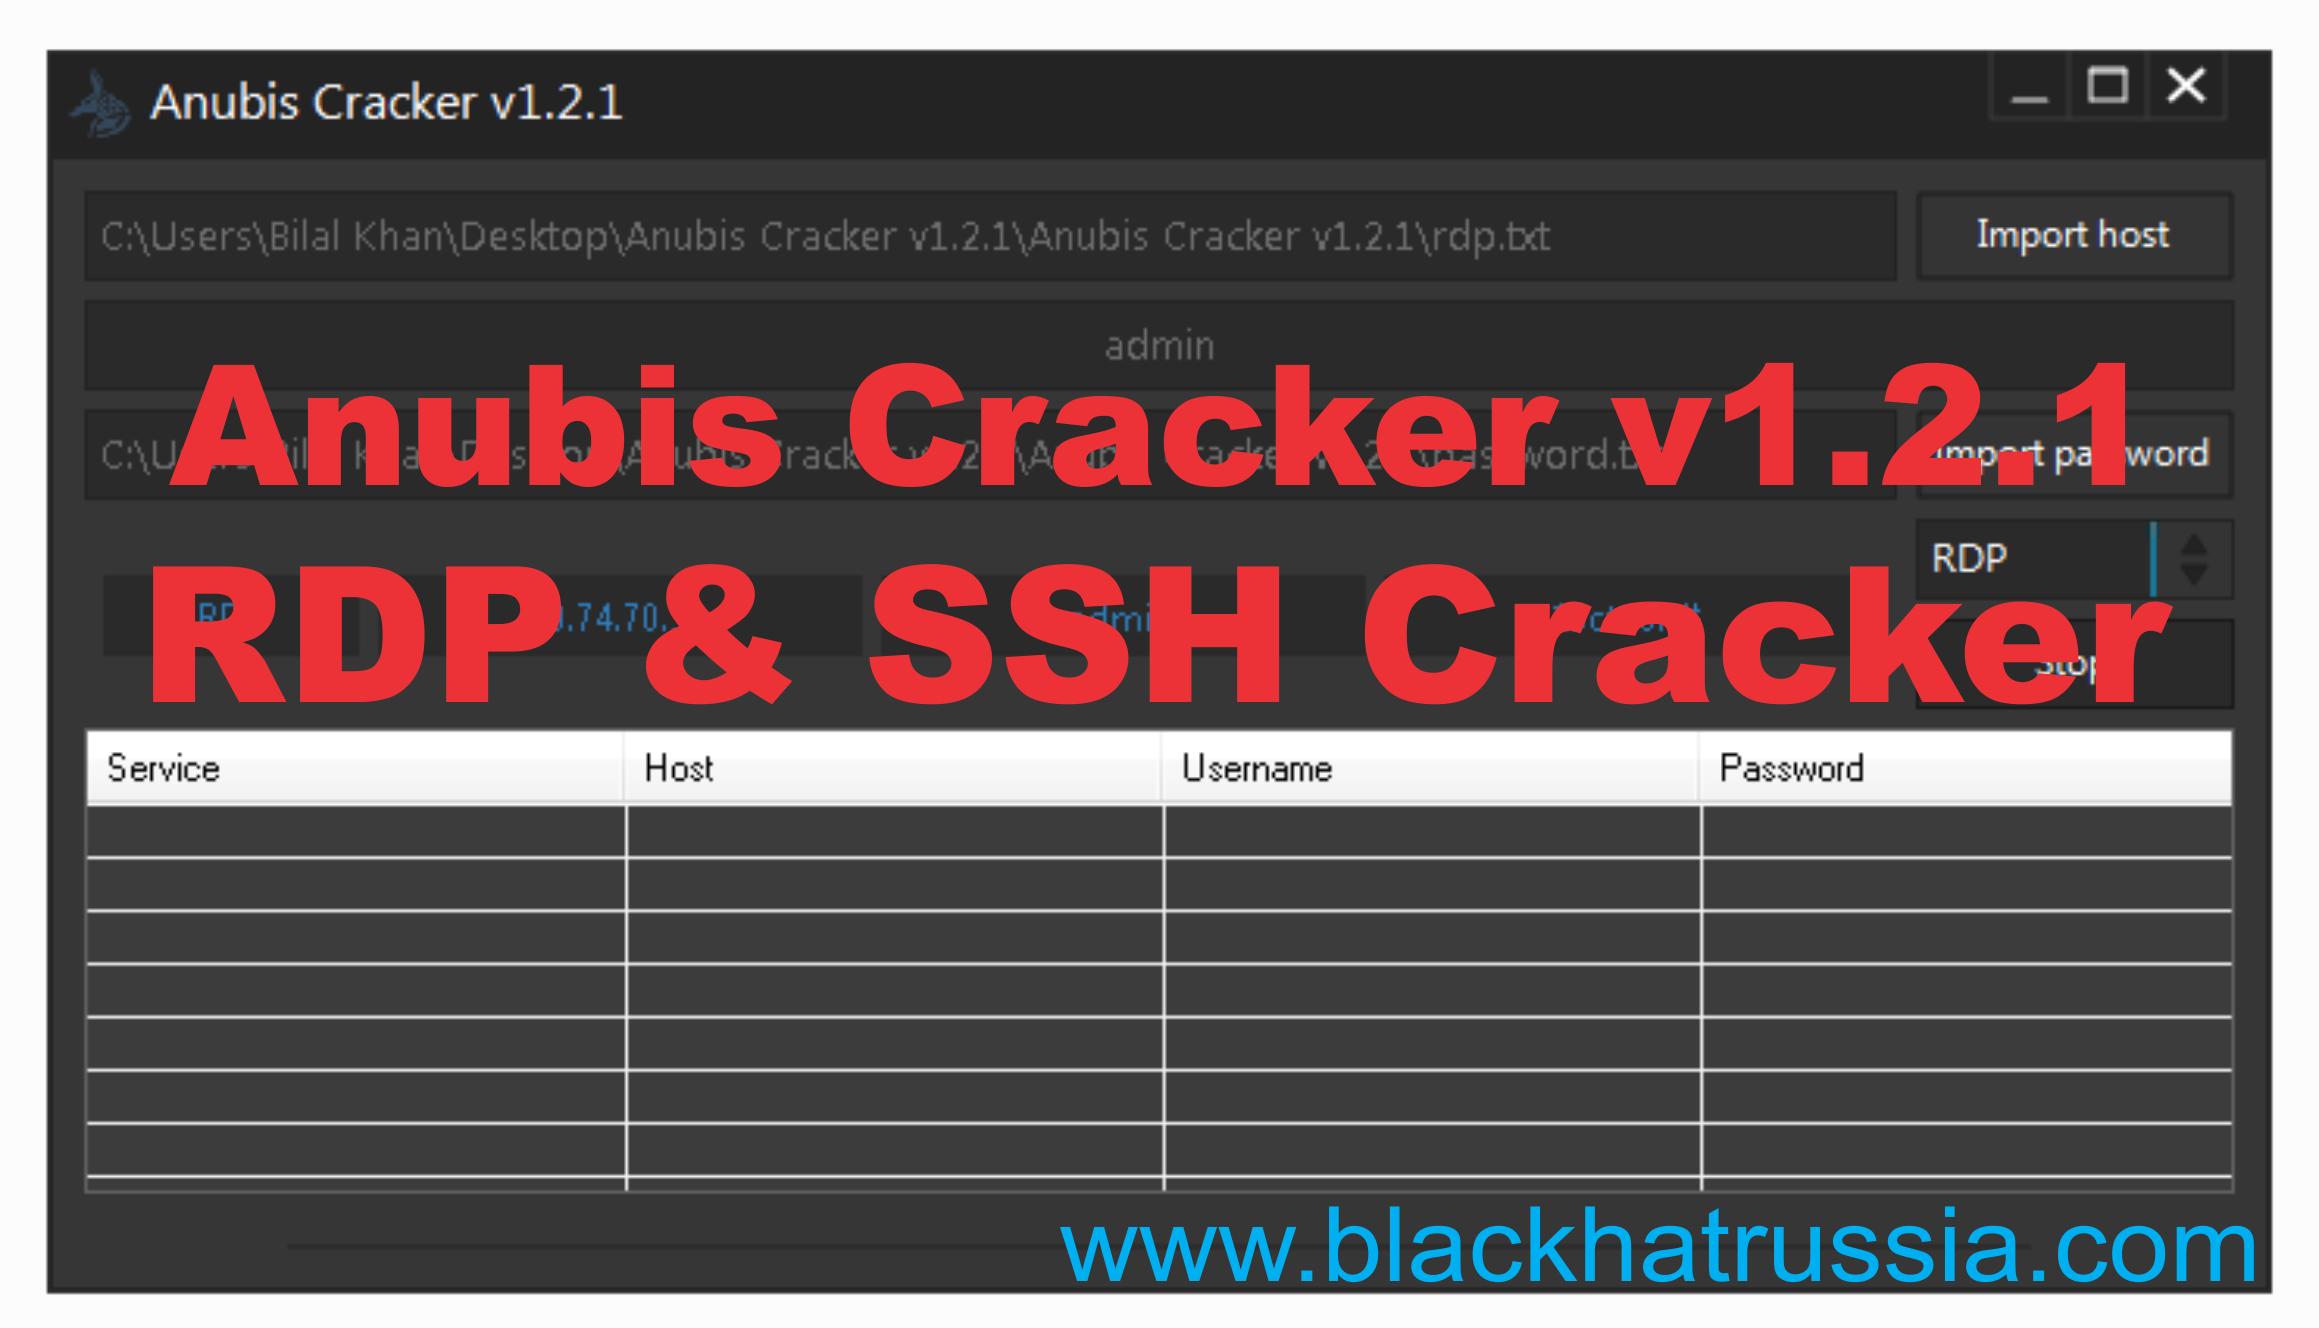 ANUBIS CRACKER V.1.2.1 BRUTE FORCE SSH/RDP